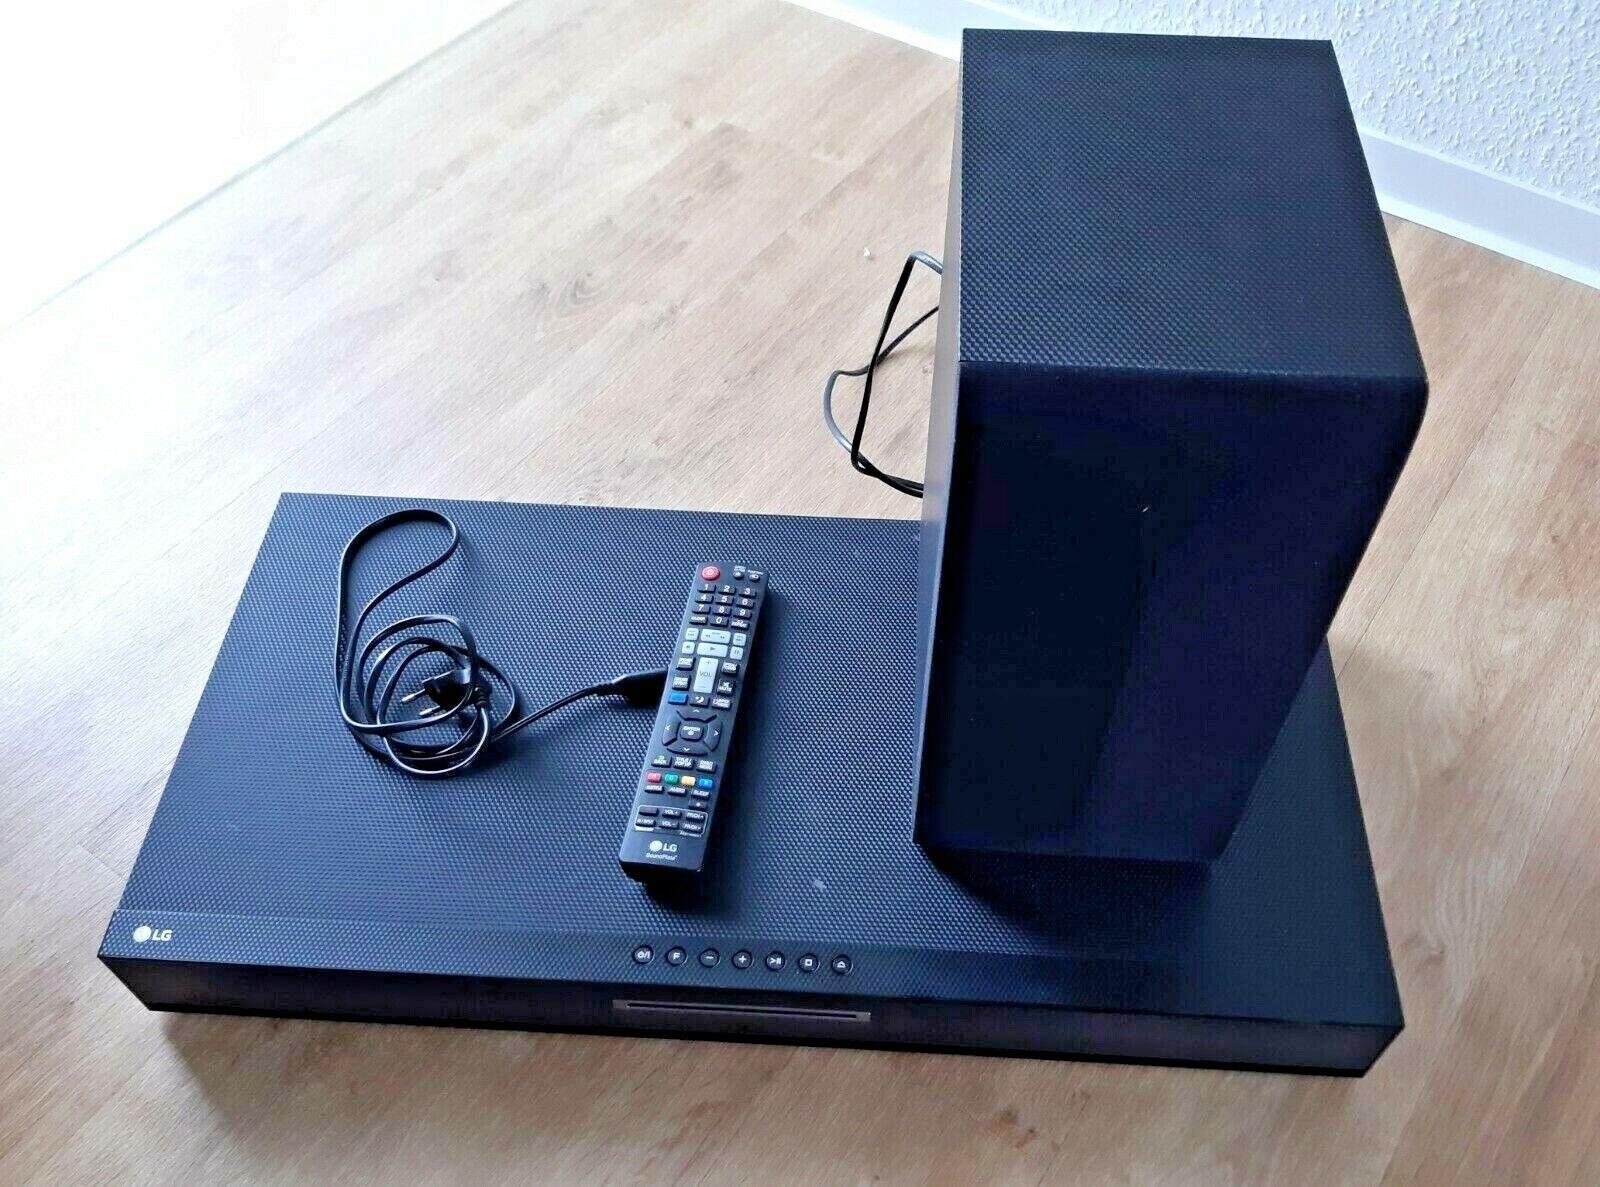 LG Soundplate LAD650W 2.1 Heimkino System - Blu-Ray Player, WiFi, Bluetooth